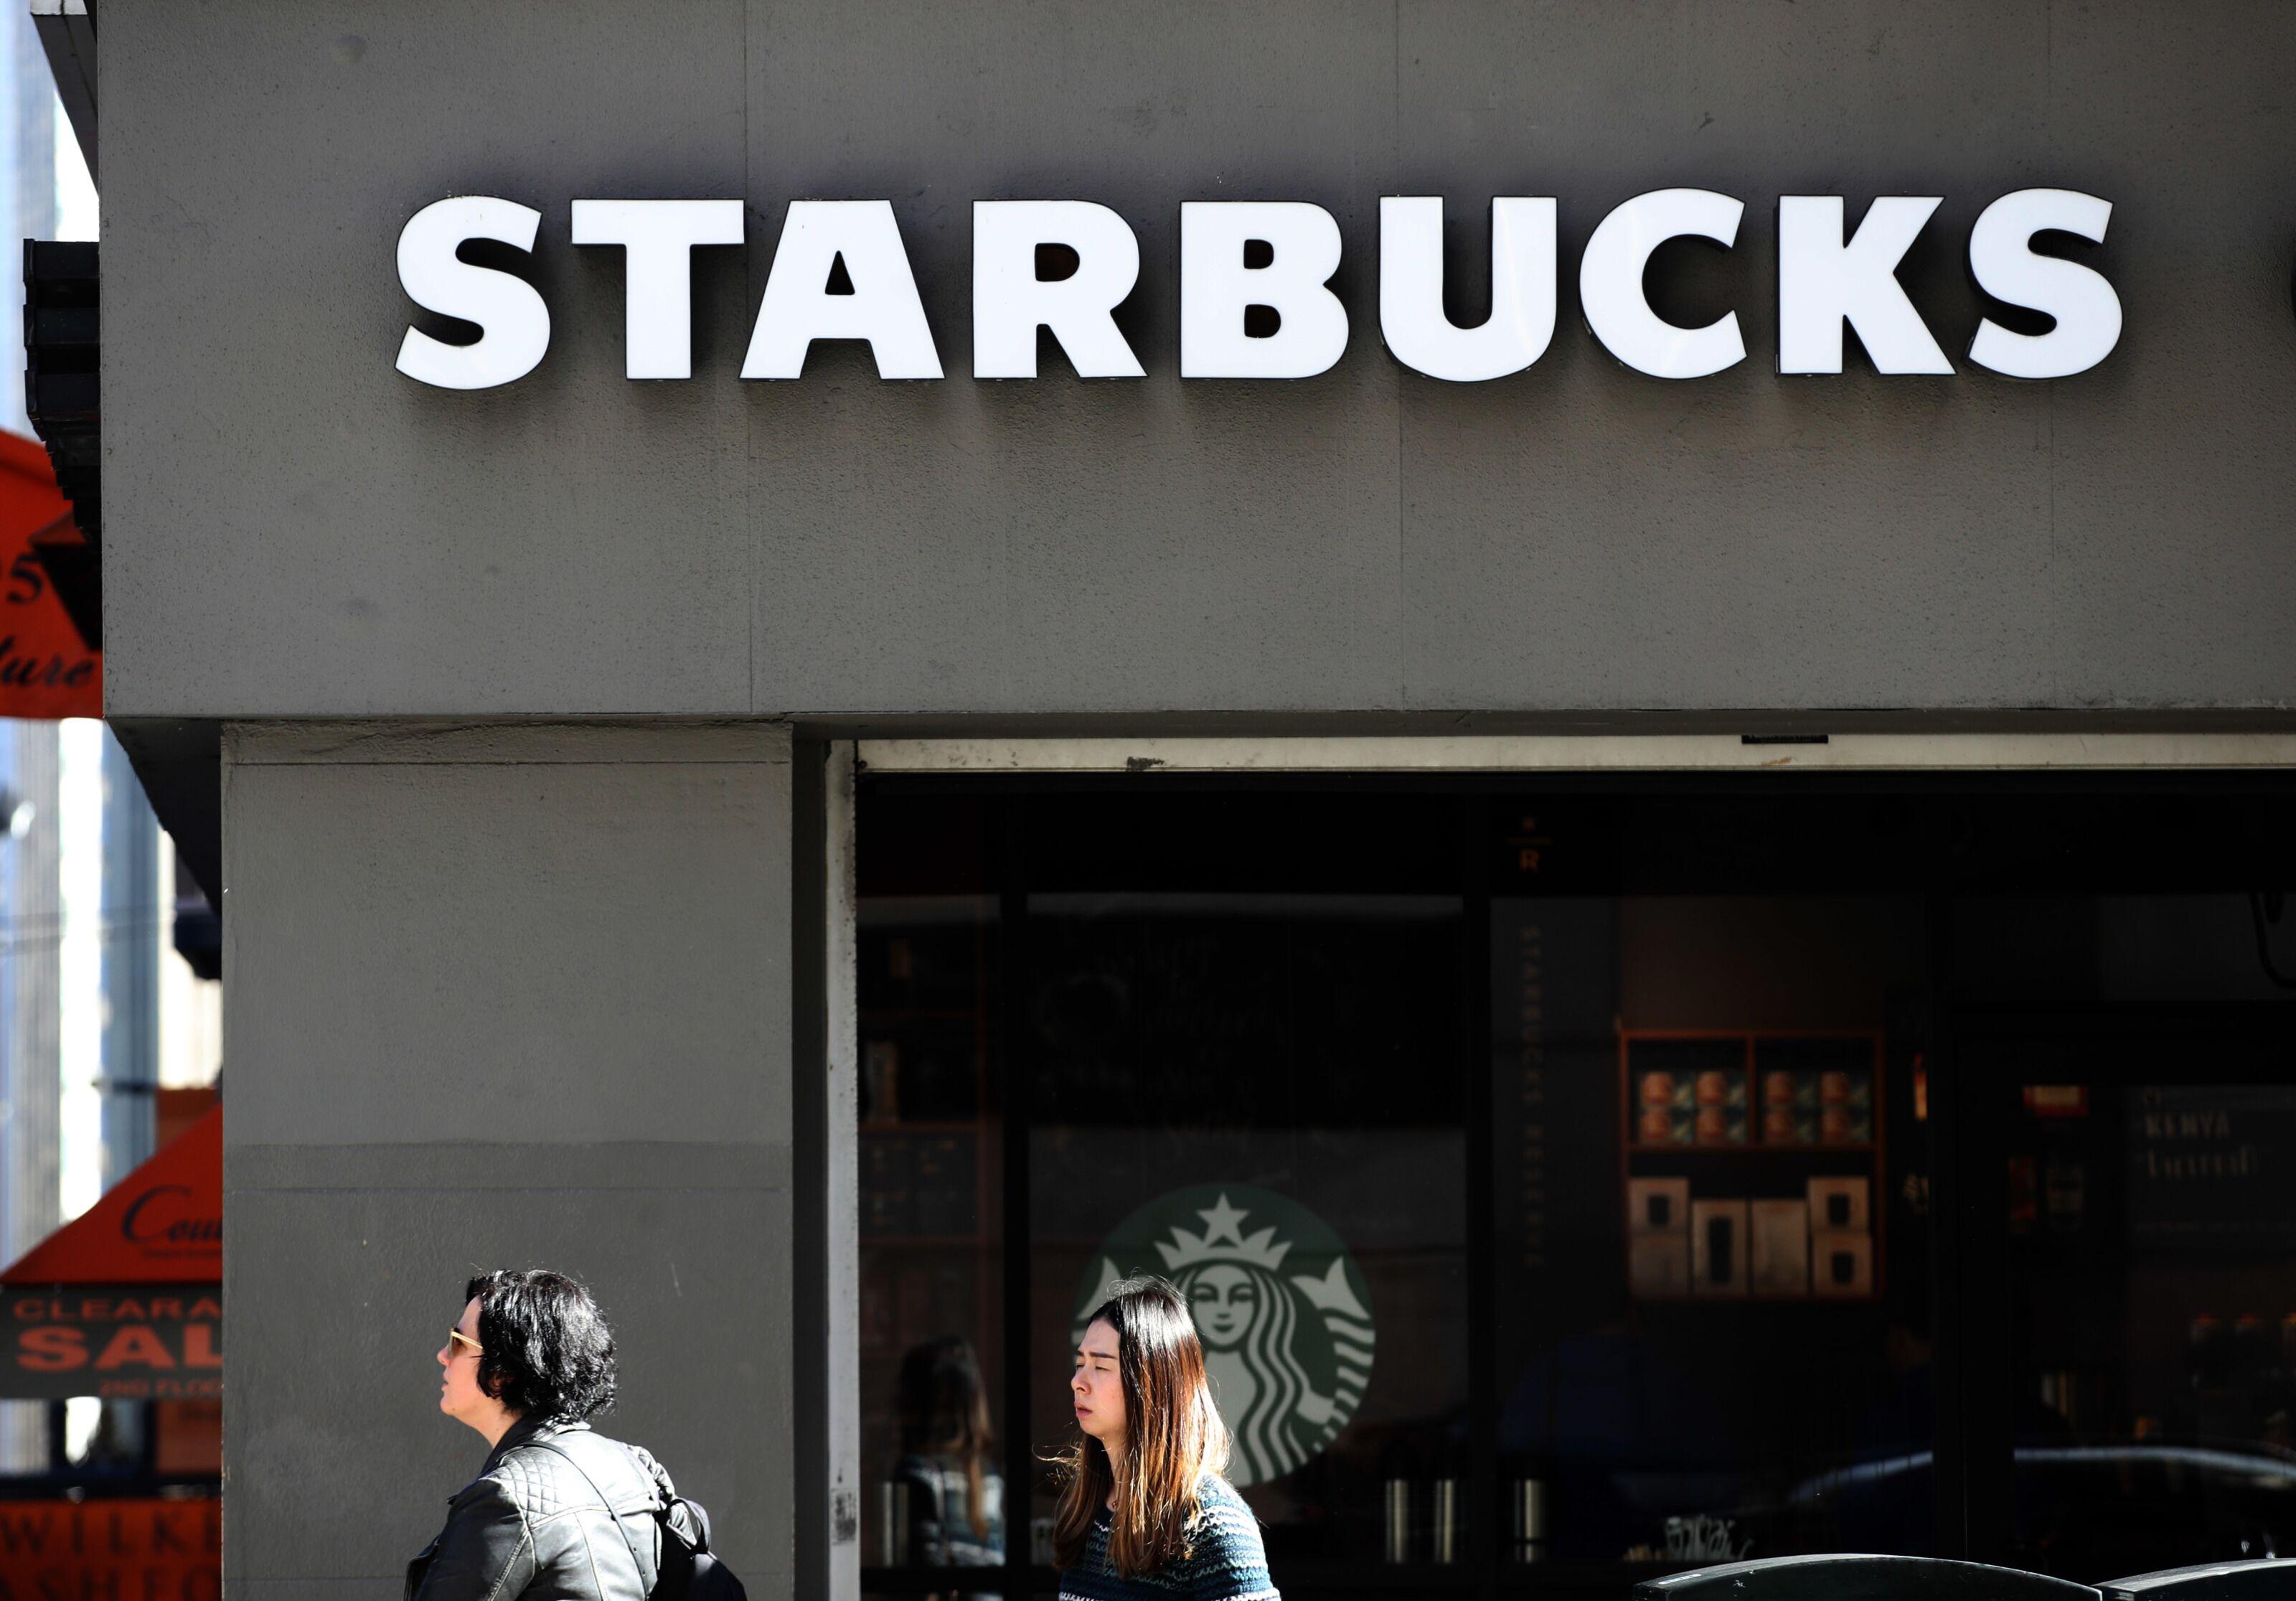 Starbucks celebrity style: From Miley Cyrus to Kim Kardashian, stars' favorite drinks